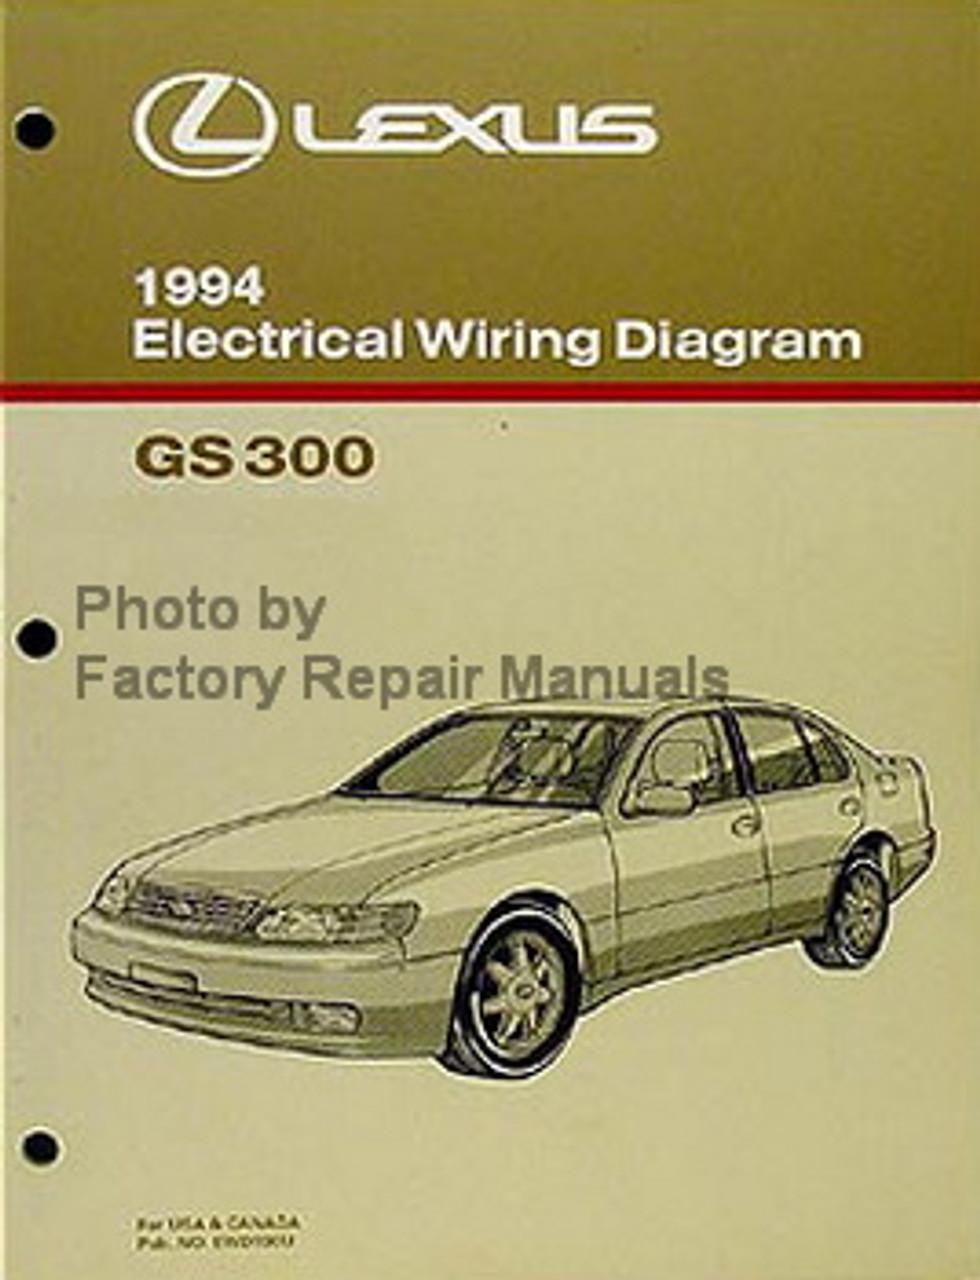 1994 lexus gs300 wiring diagram 1994 lexus gs300 electrical wiring diagrams gs 300 original manual  lexus gs300 electrical wiring diagrams